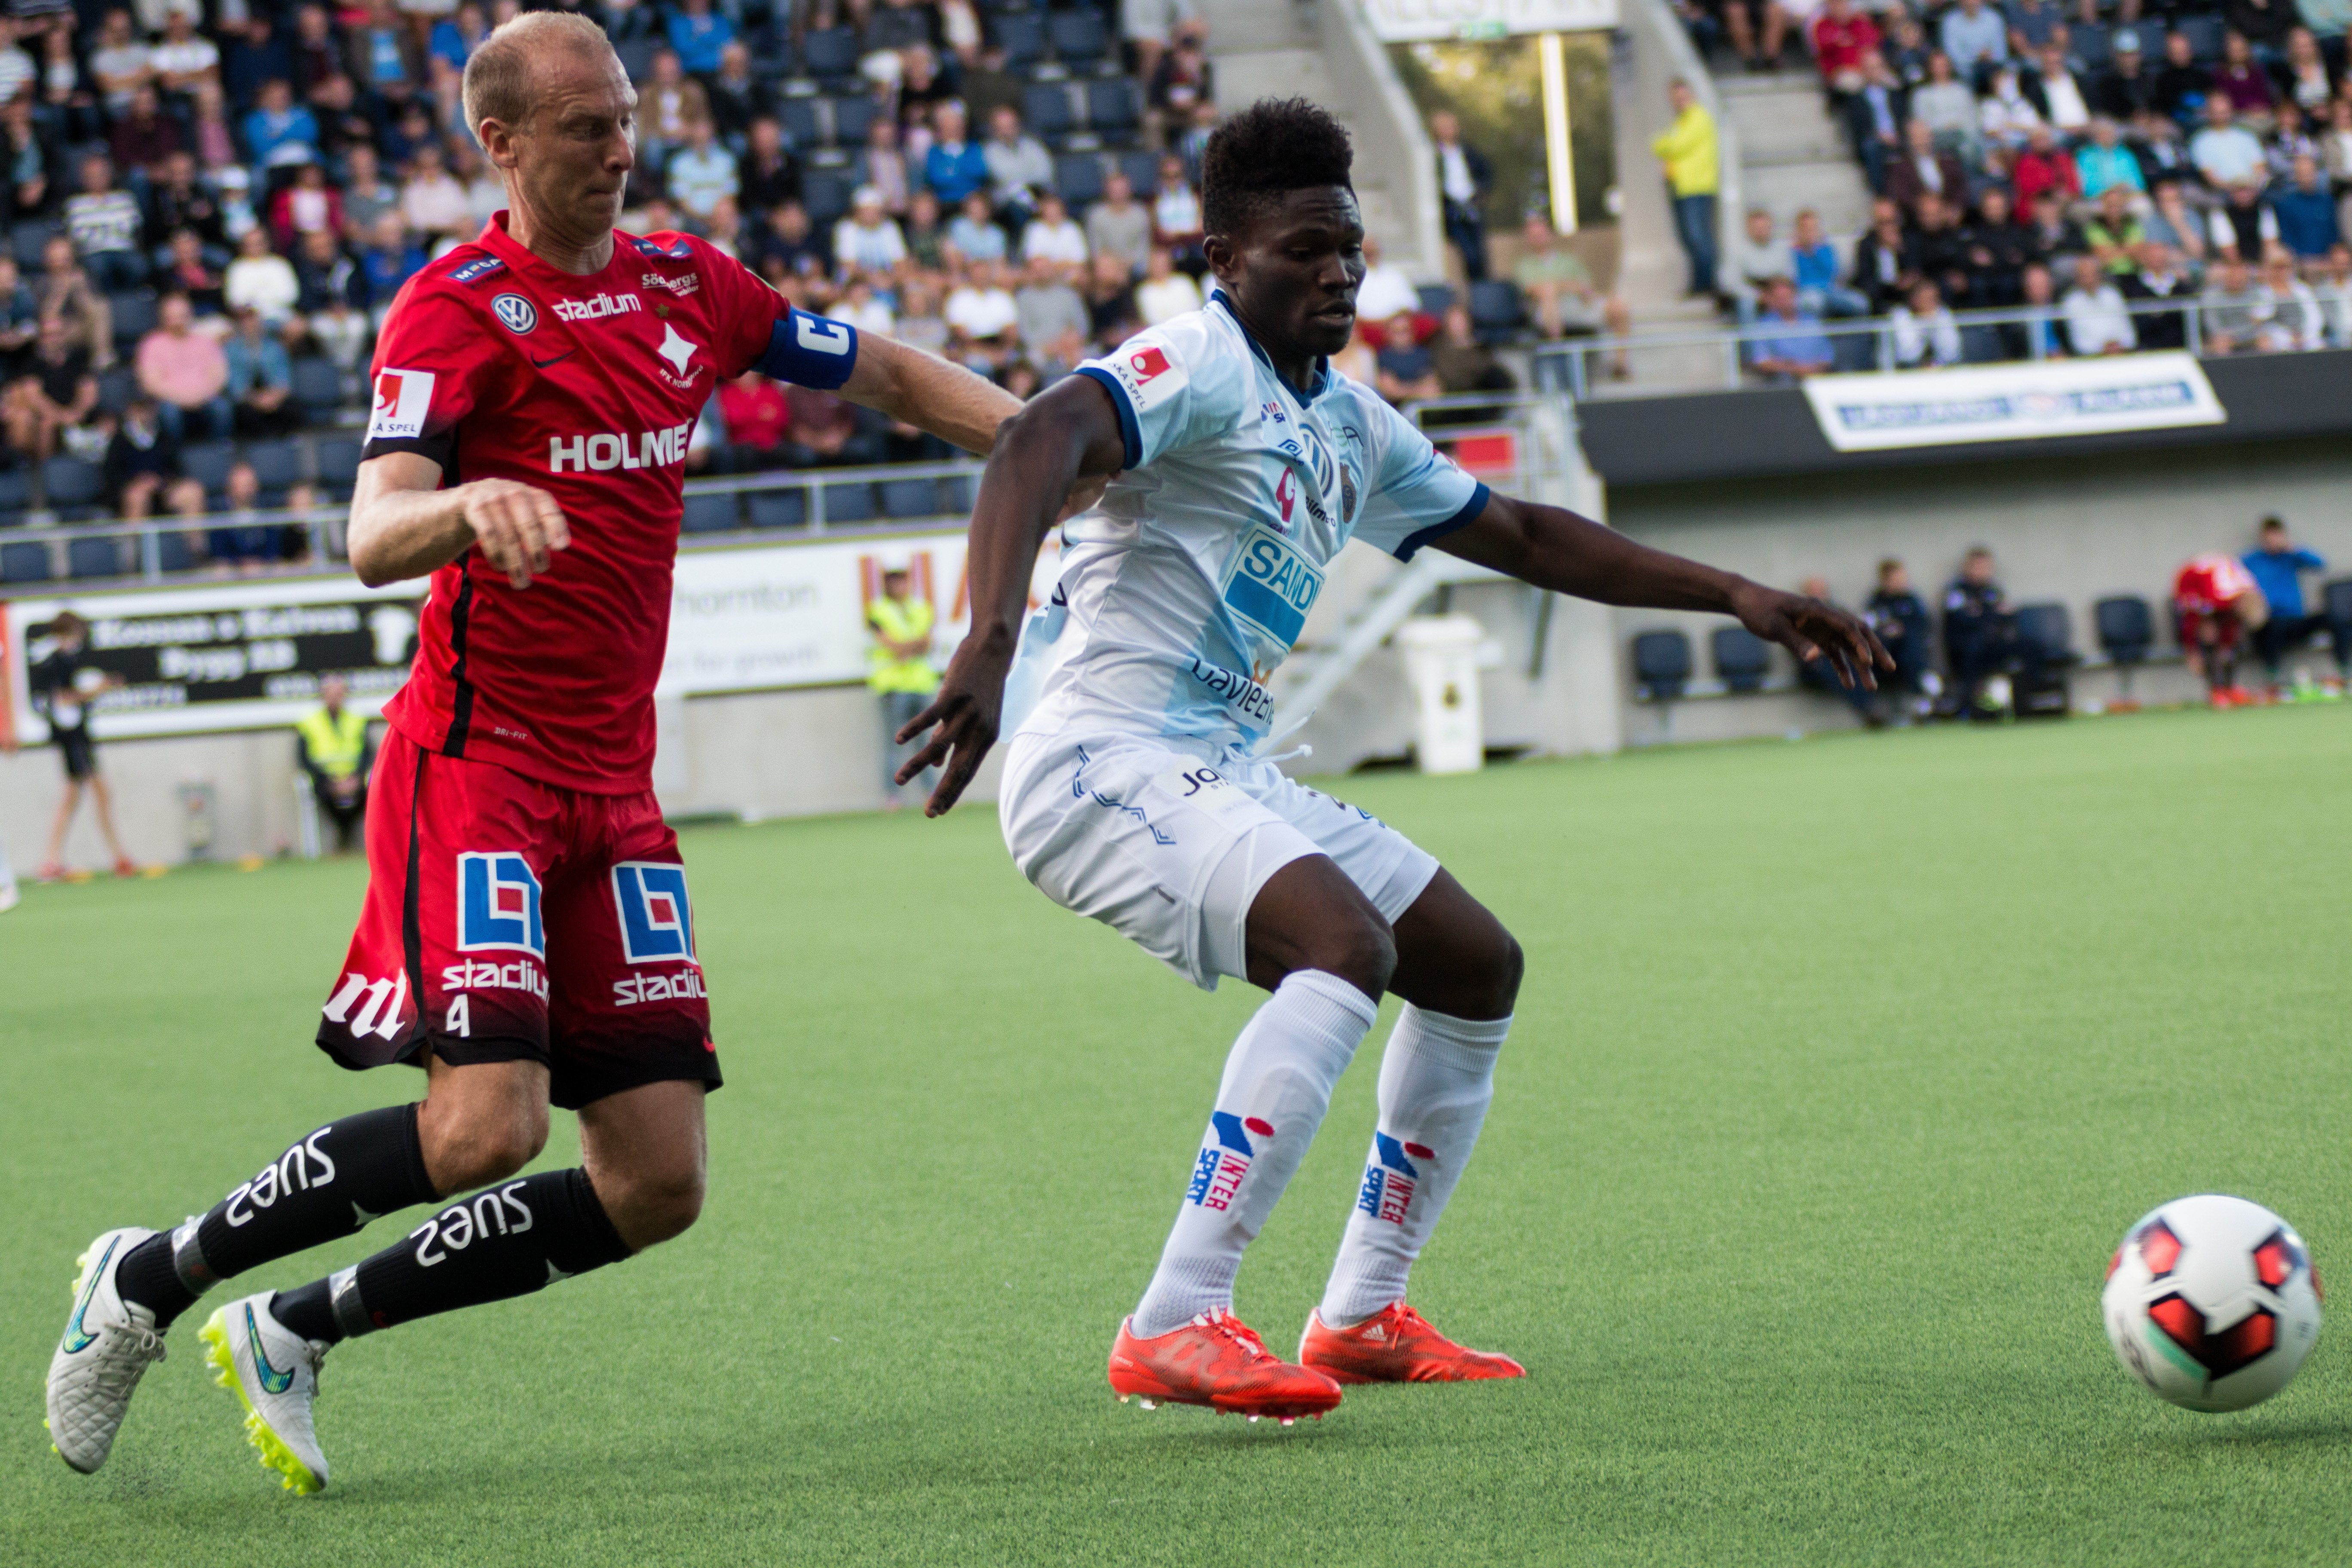 Goteborg vann kamratmotet pa gamla ullevi